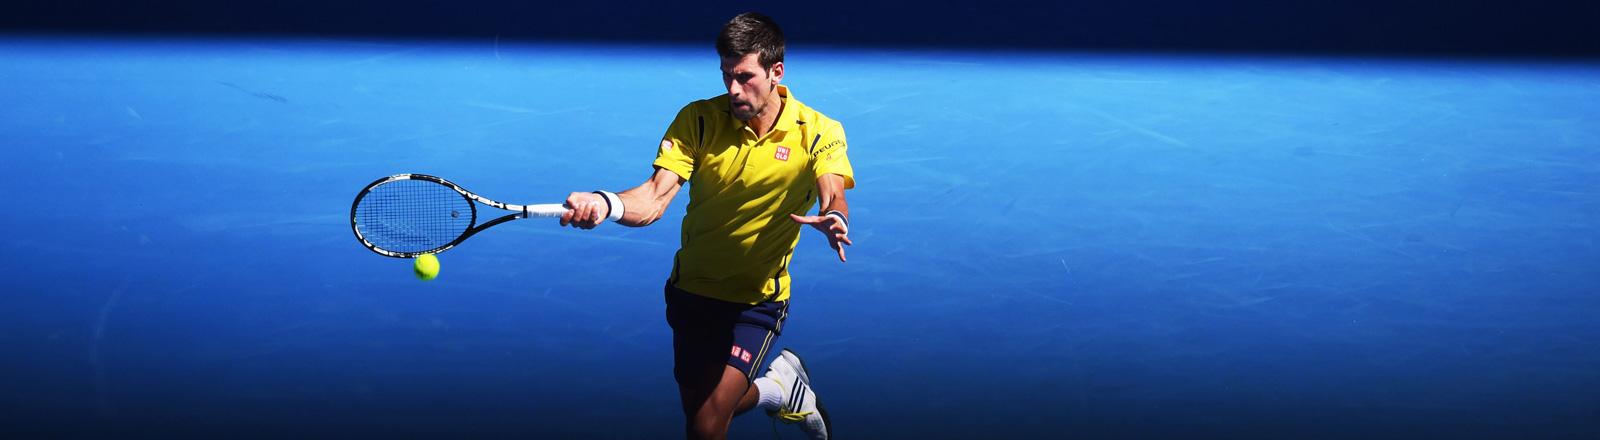 Novak Djokovic bei den Australian Open 2016.